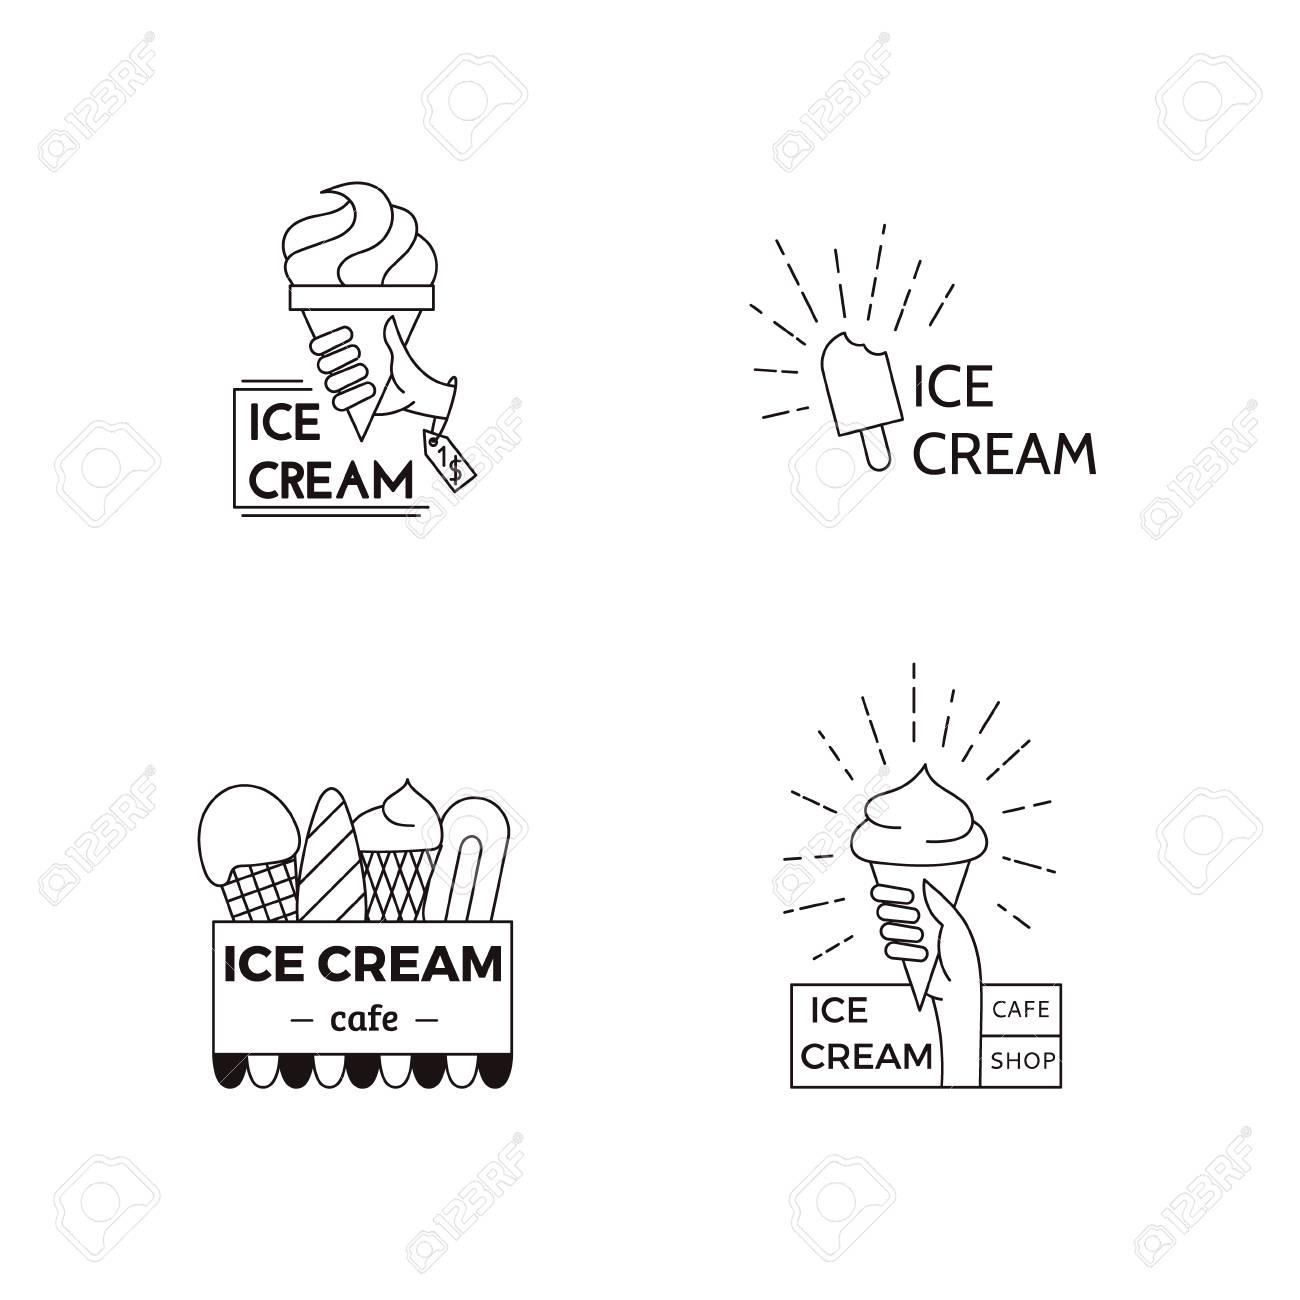 Ice Cream Label, Badge Design Template. Food Vector Line Art ...